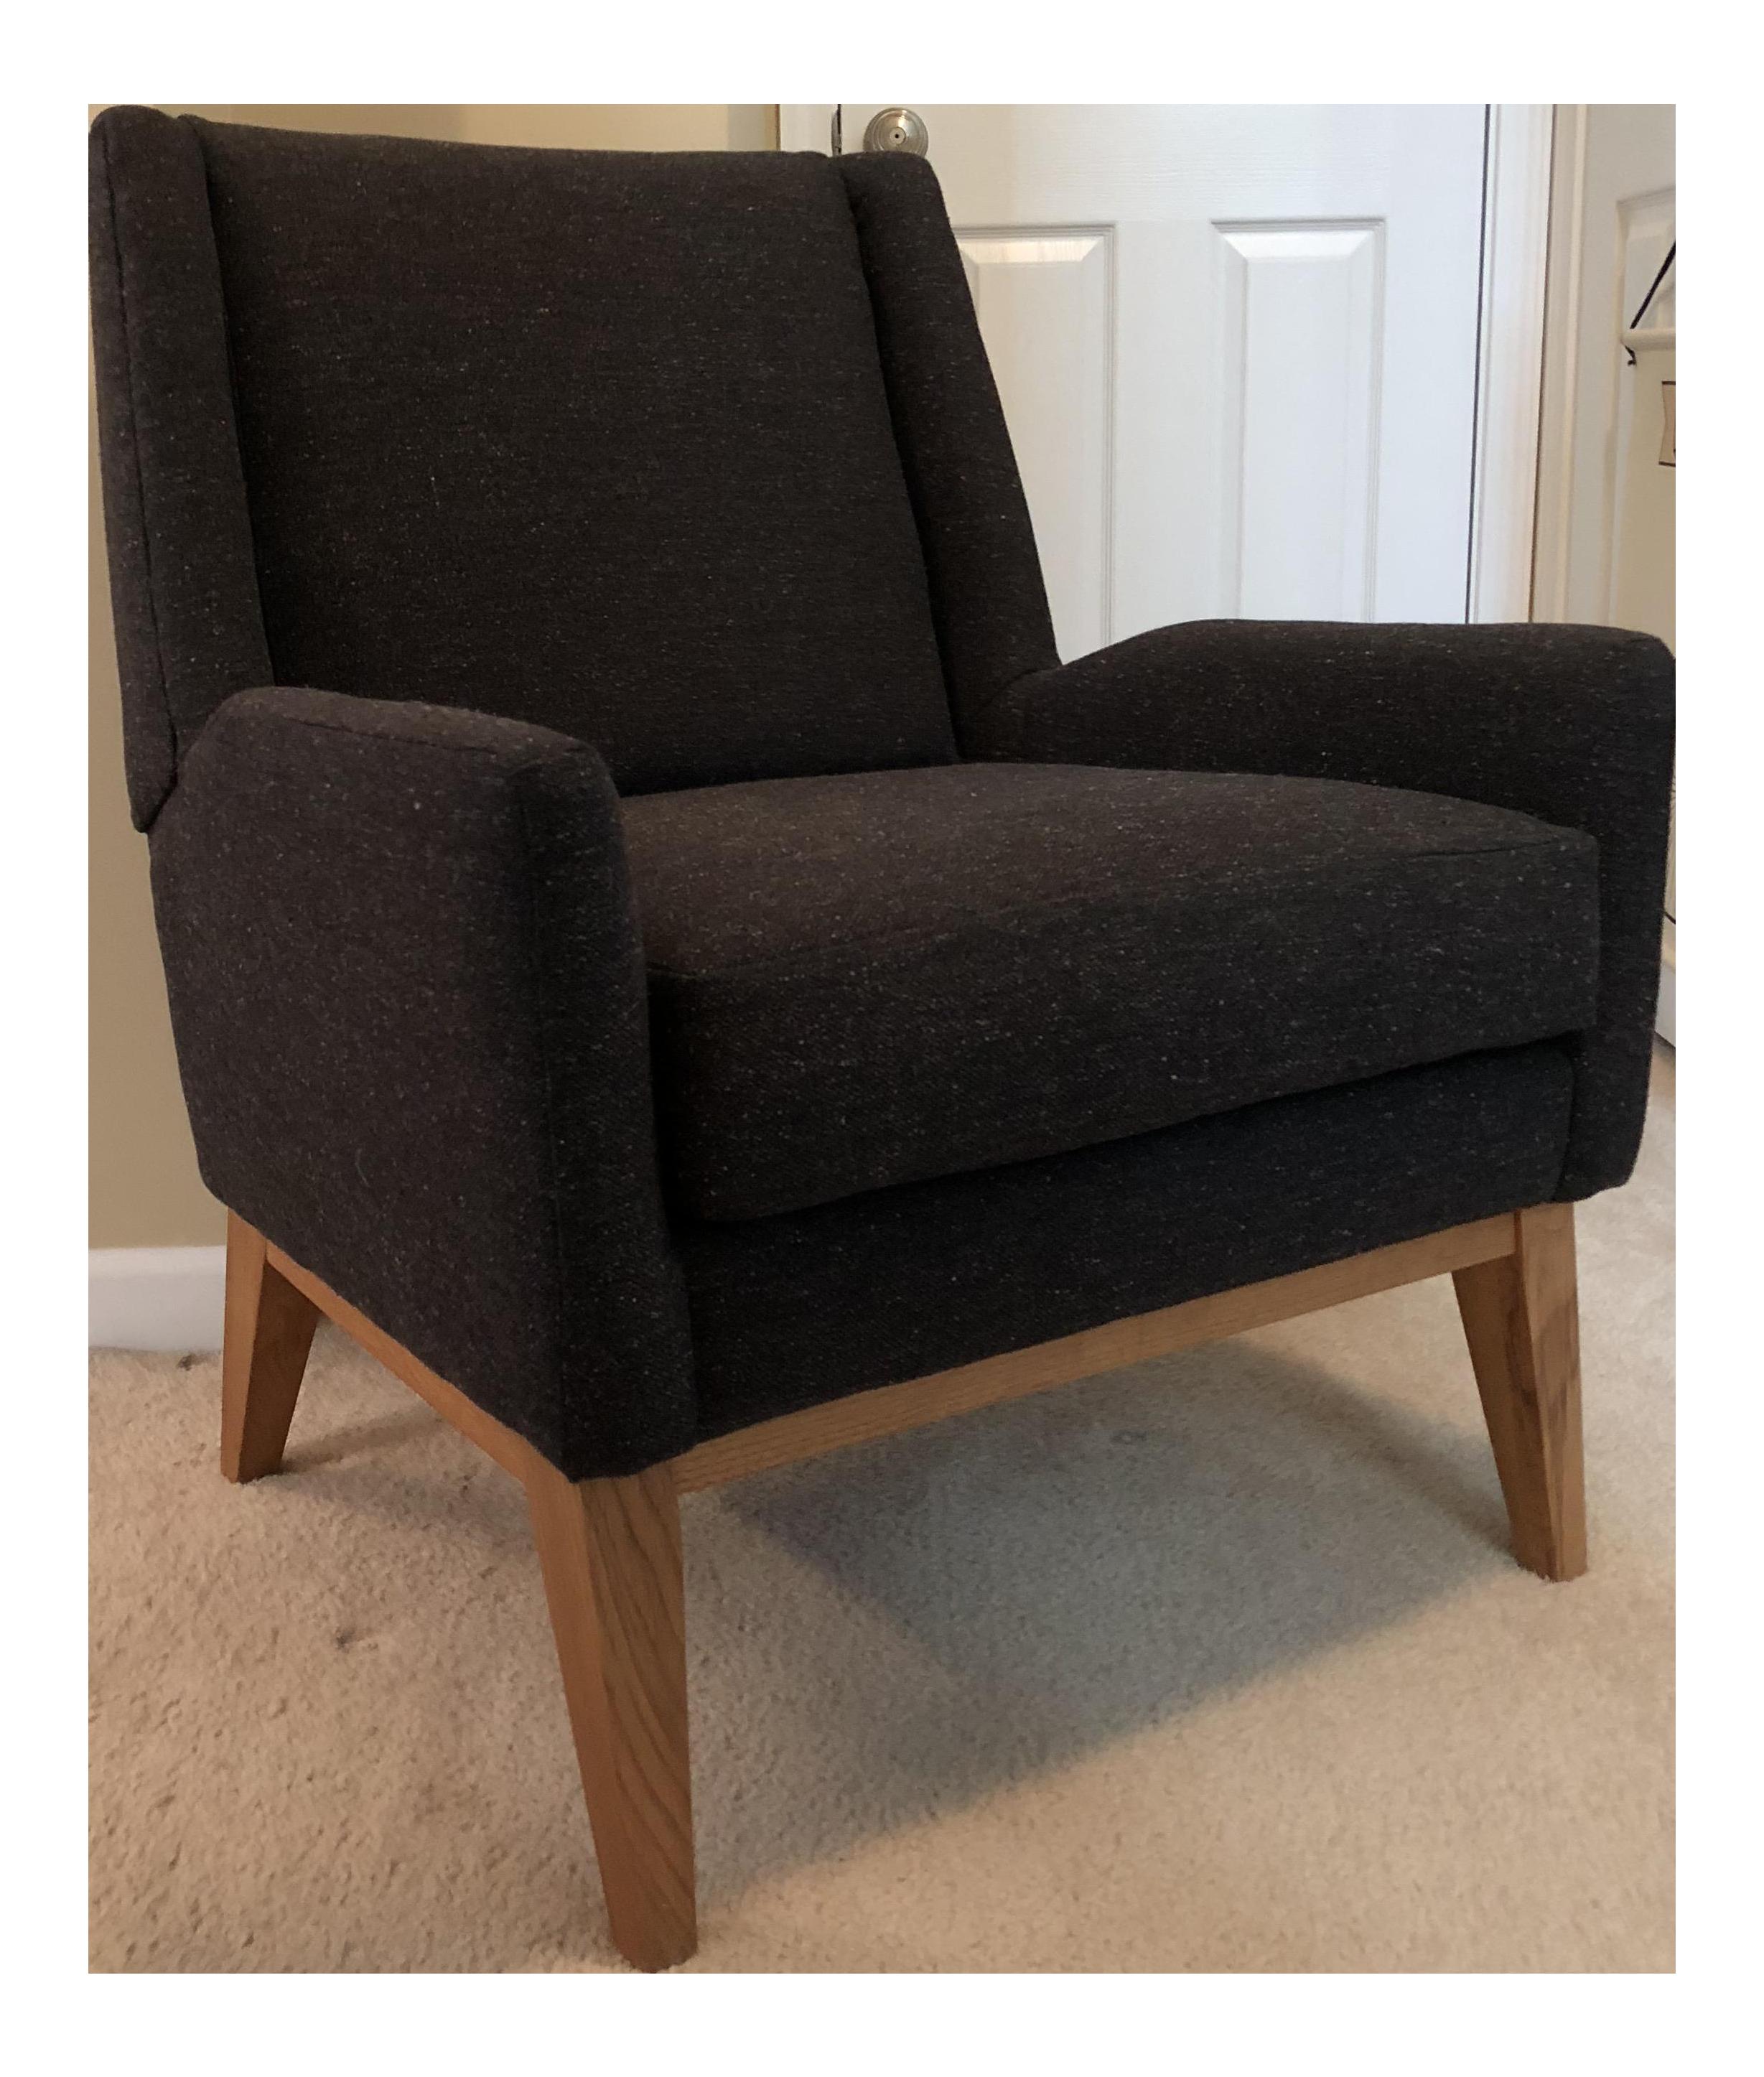 West Elm Frankie Arm Chair